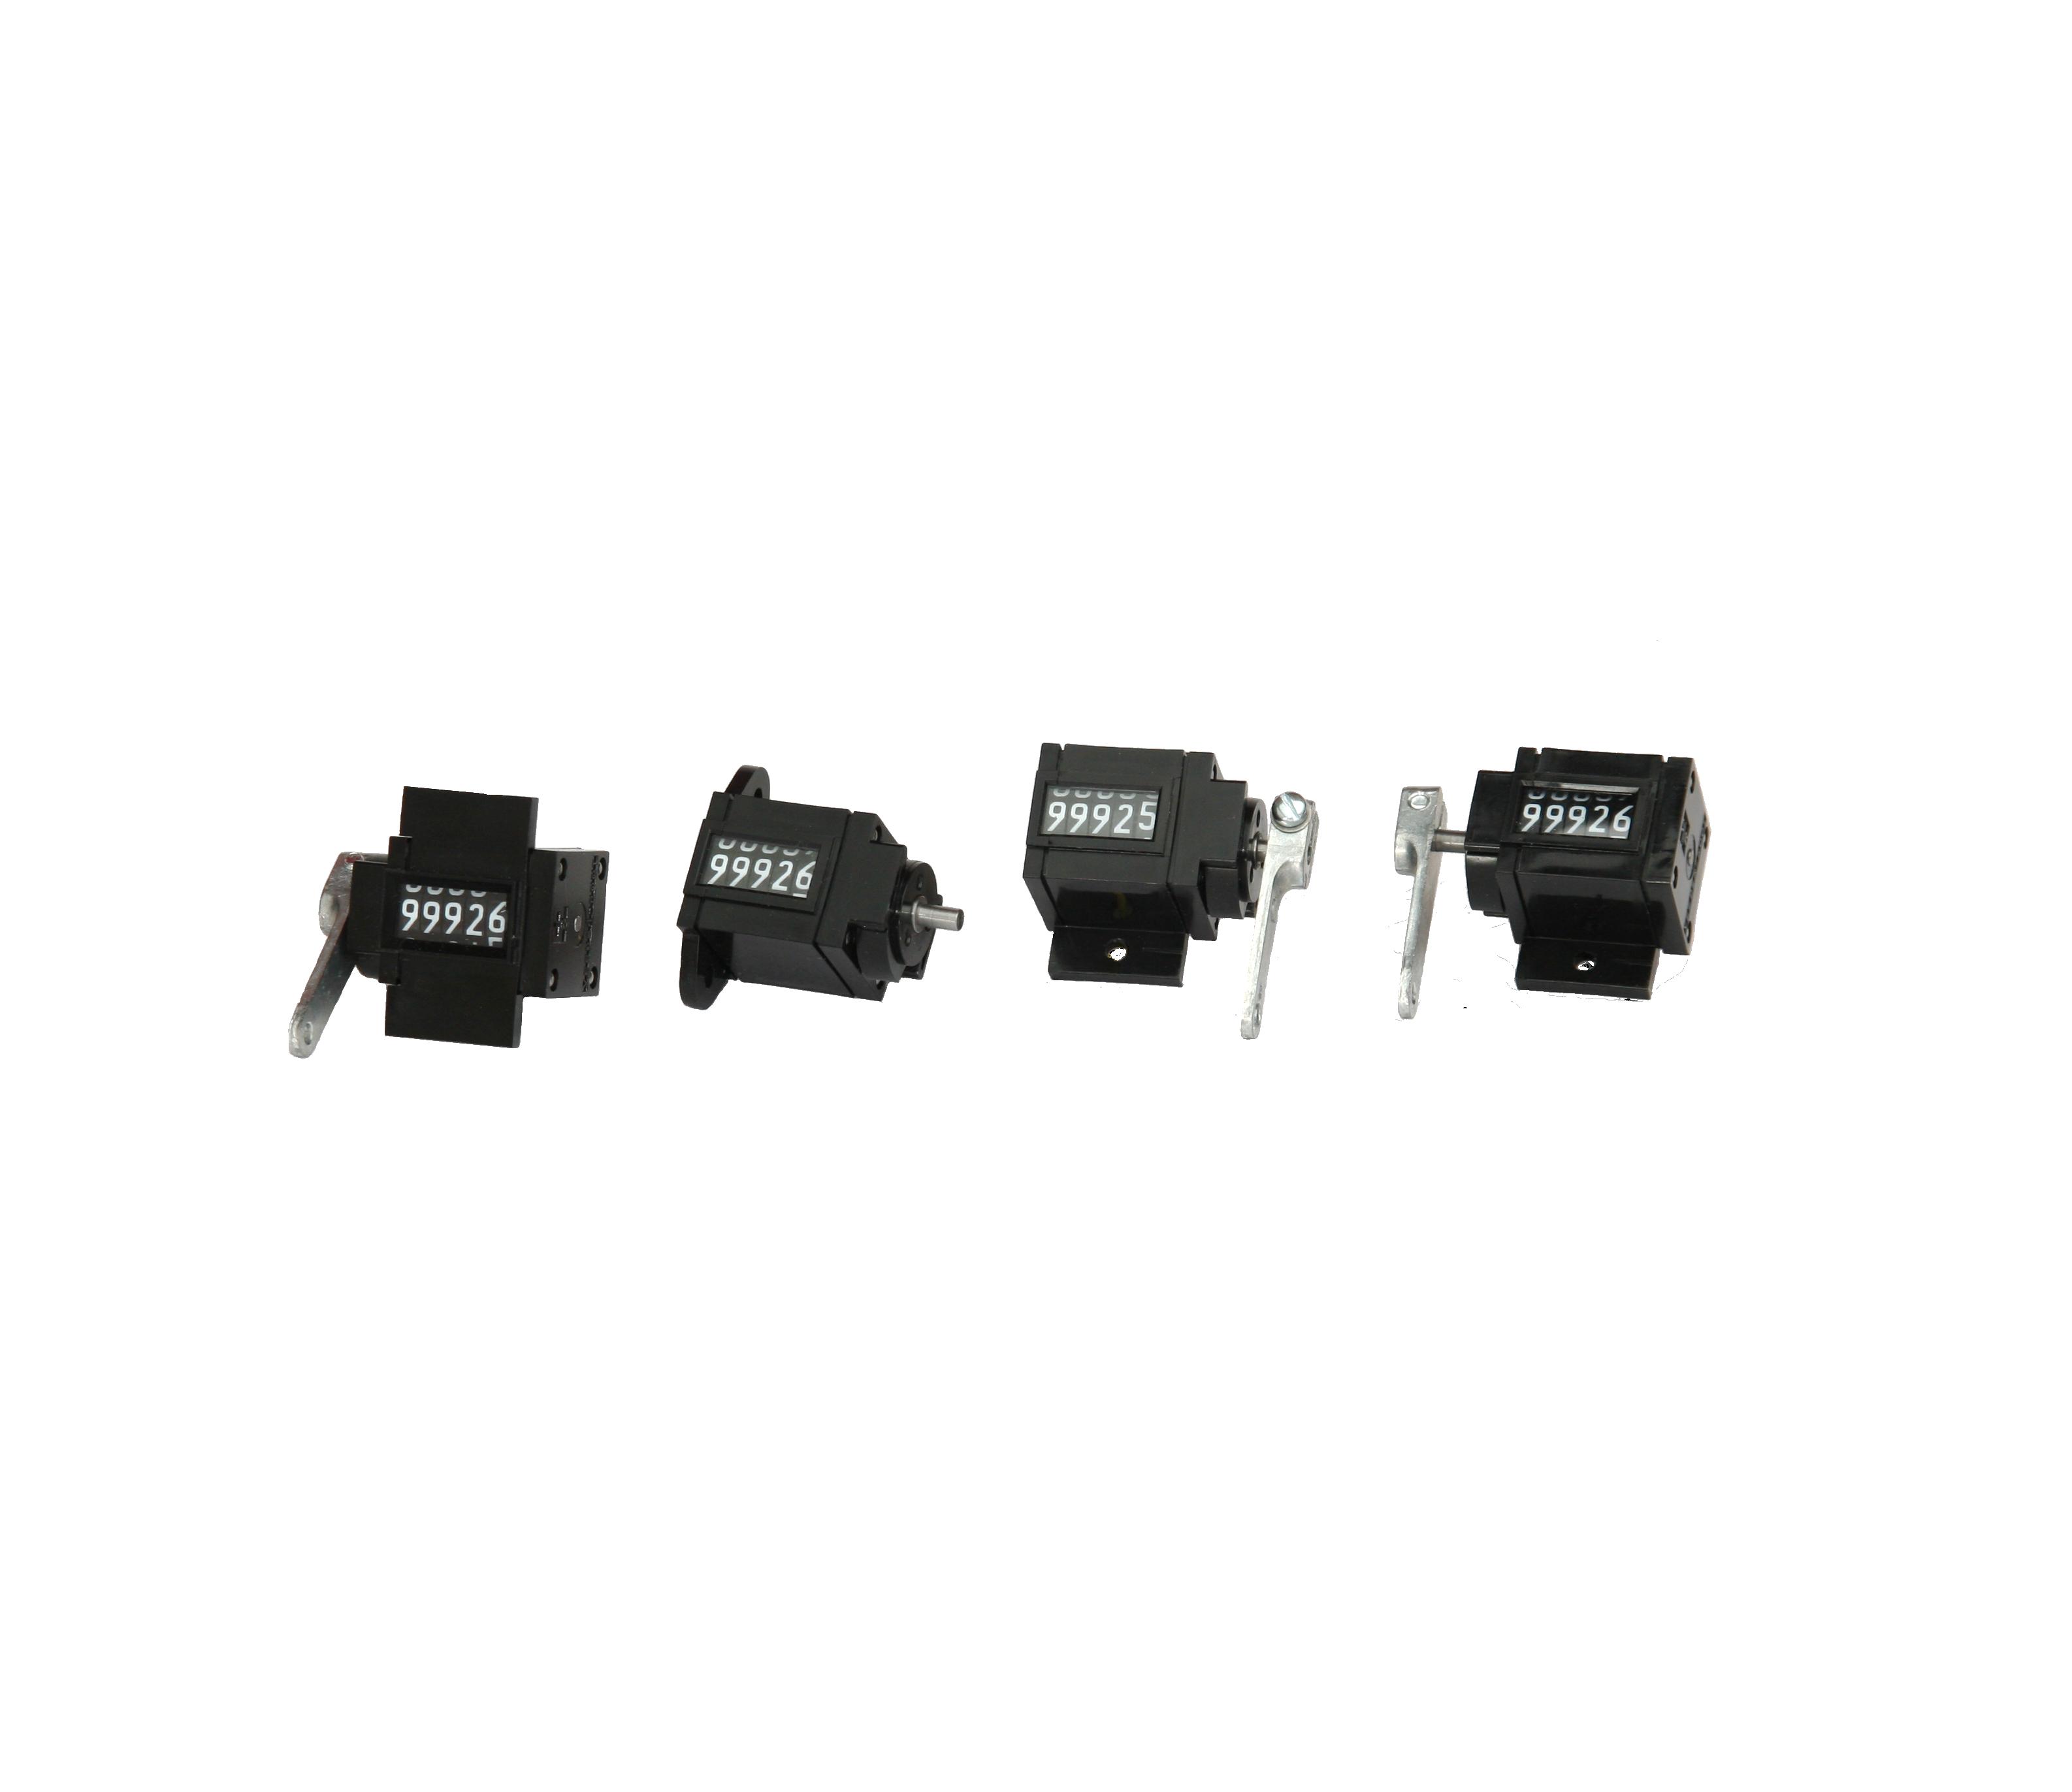 Foto do produto Contador de Golpes Veeder-Root 7460/7461 - Small Square Case